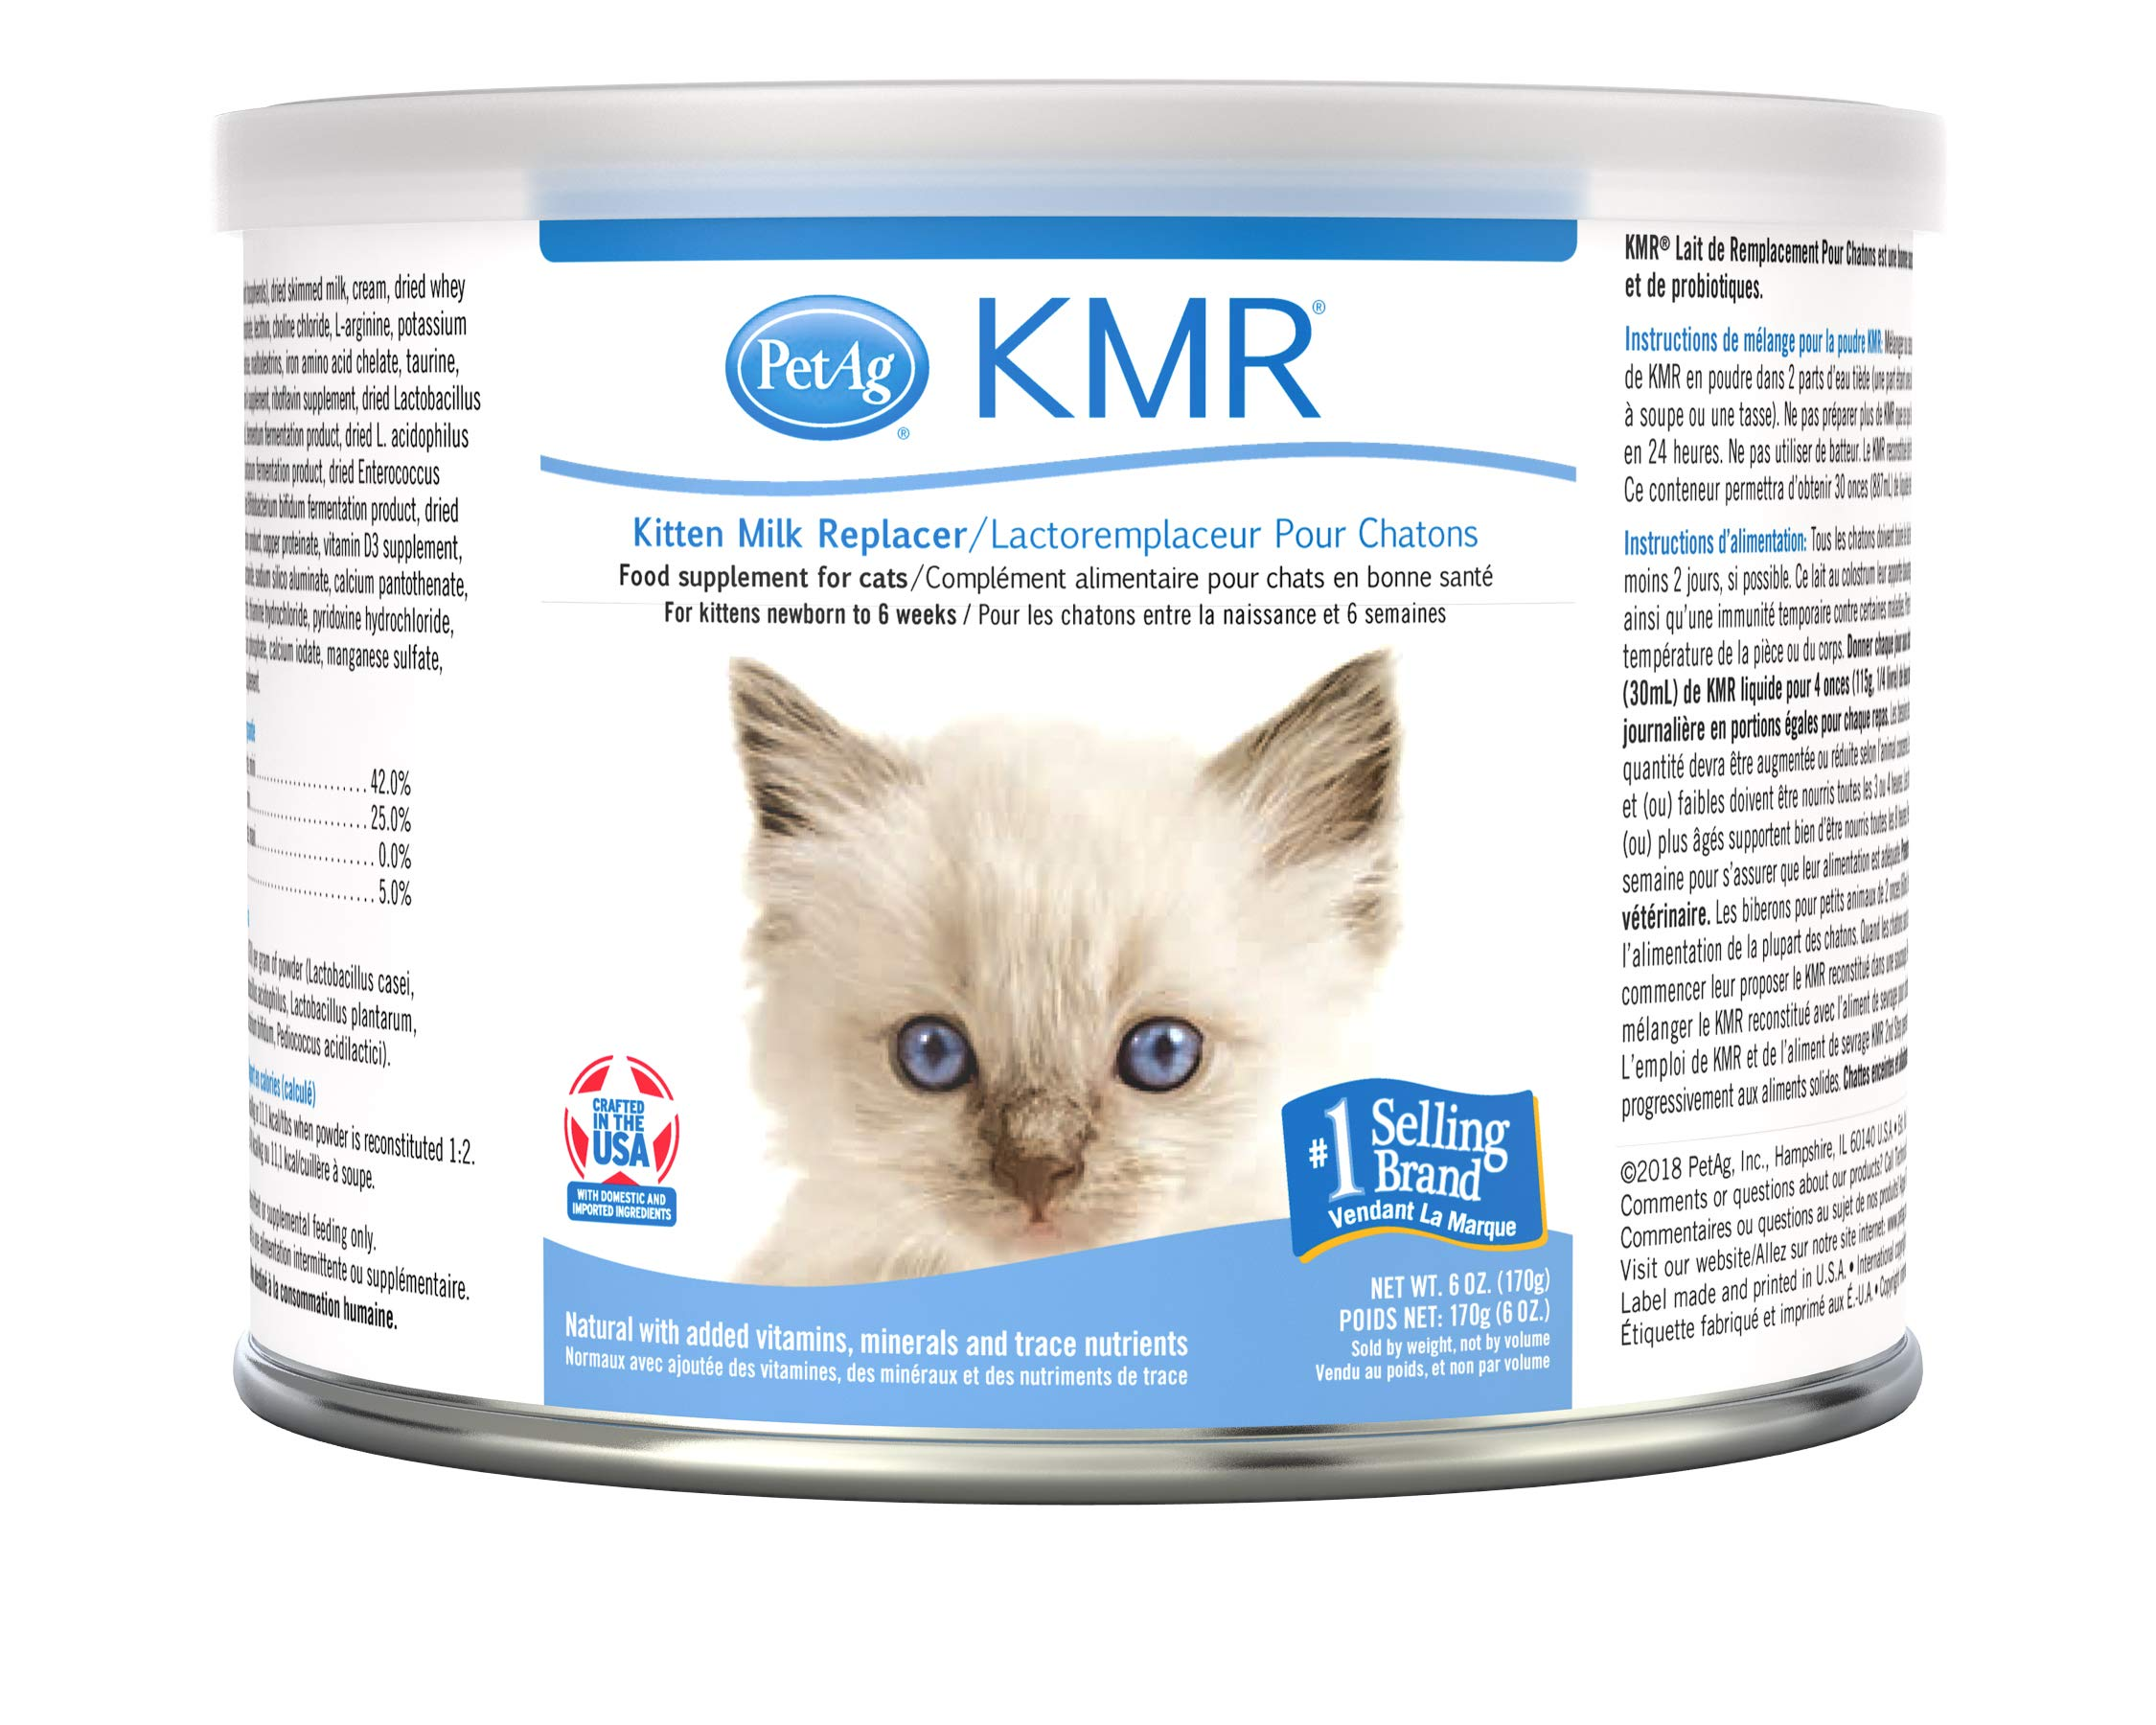 PetAg KMR Kitten Milk Replacer Powder - Prebiotics and Probiotics - Newborn to Six Weeks - Kitten Formula - 6 oz